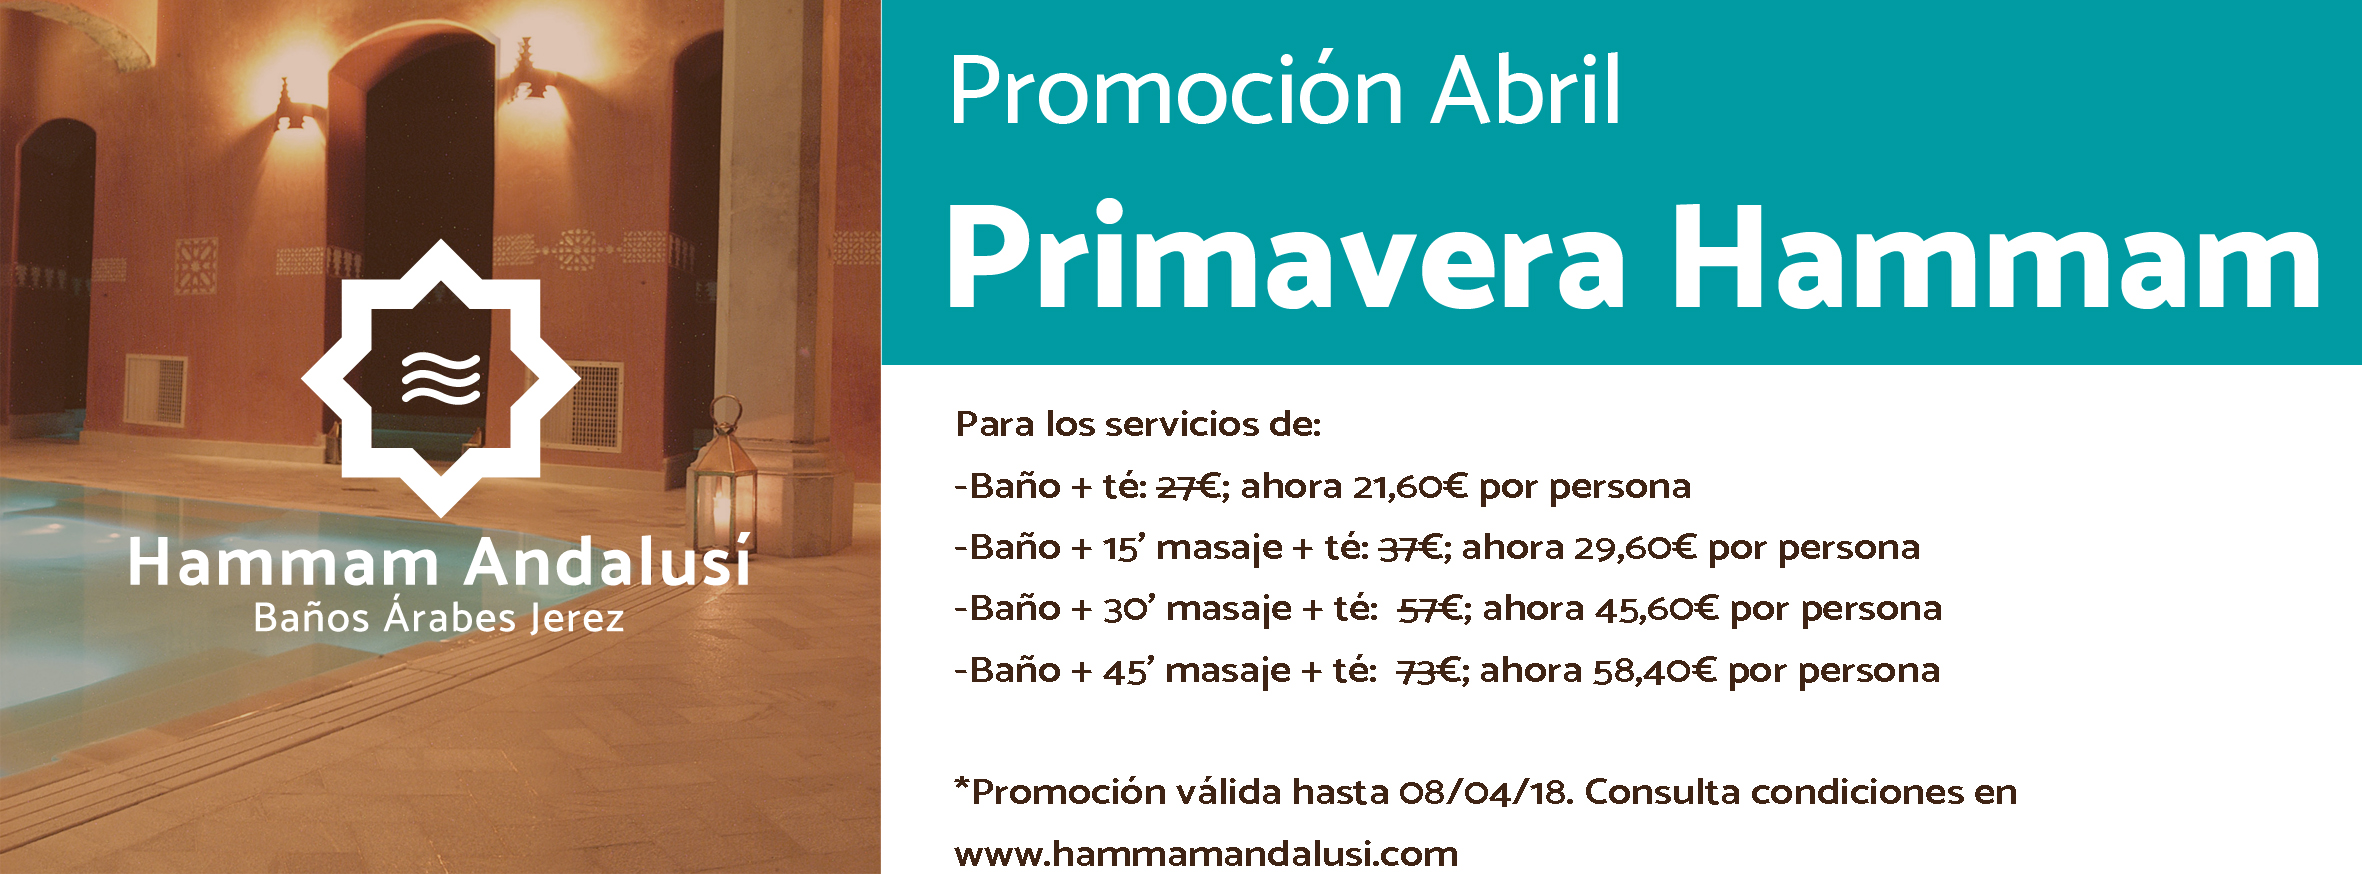 Promocion Oferta Abril Jerez Spa Baños Arabes Hammam Andalusi